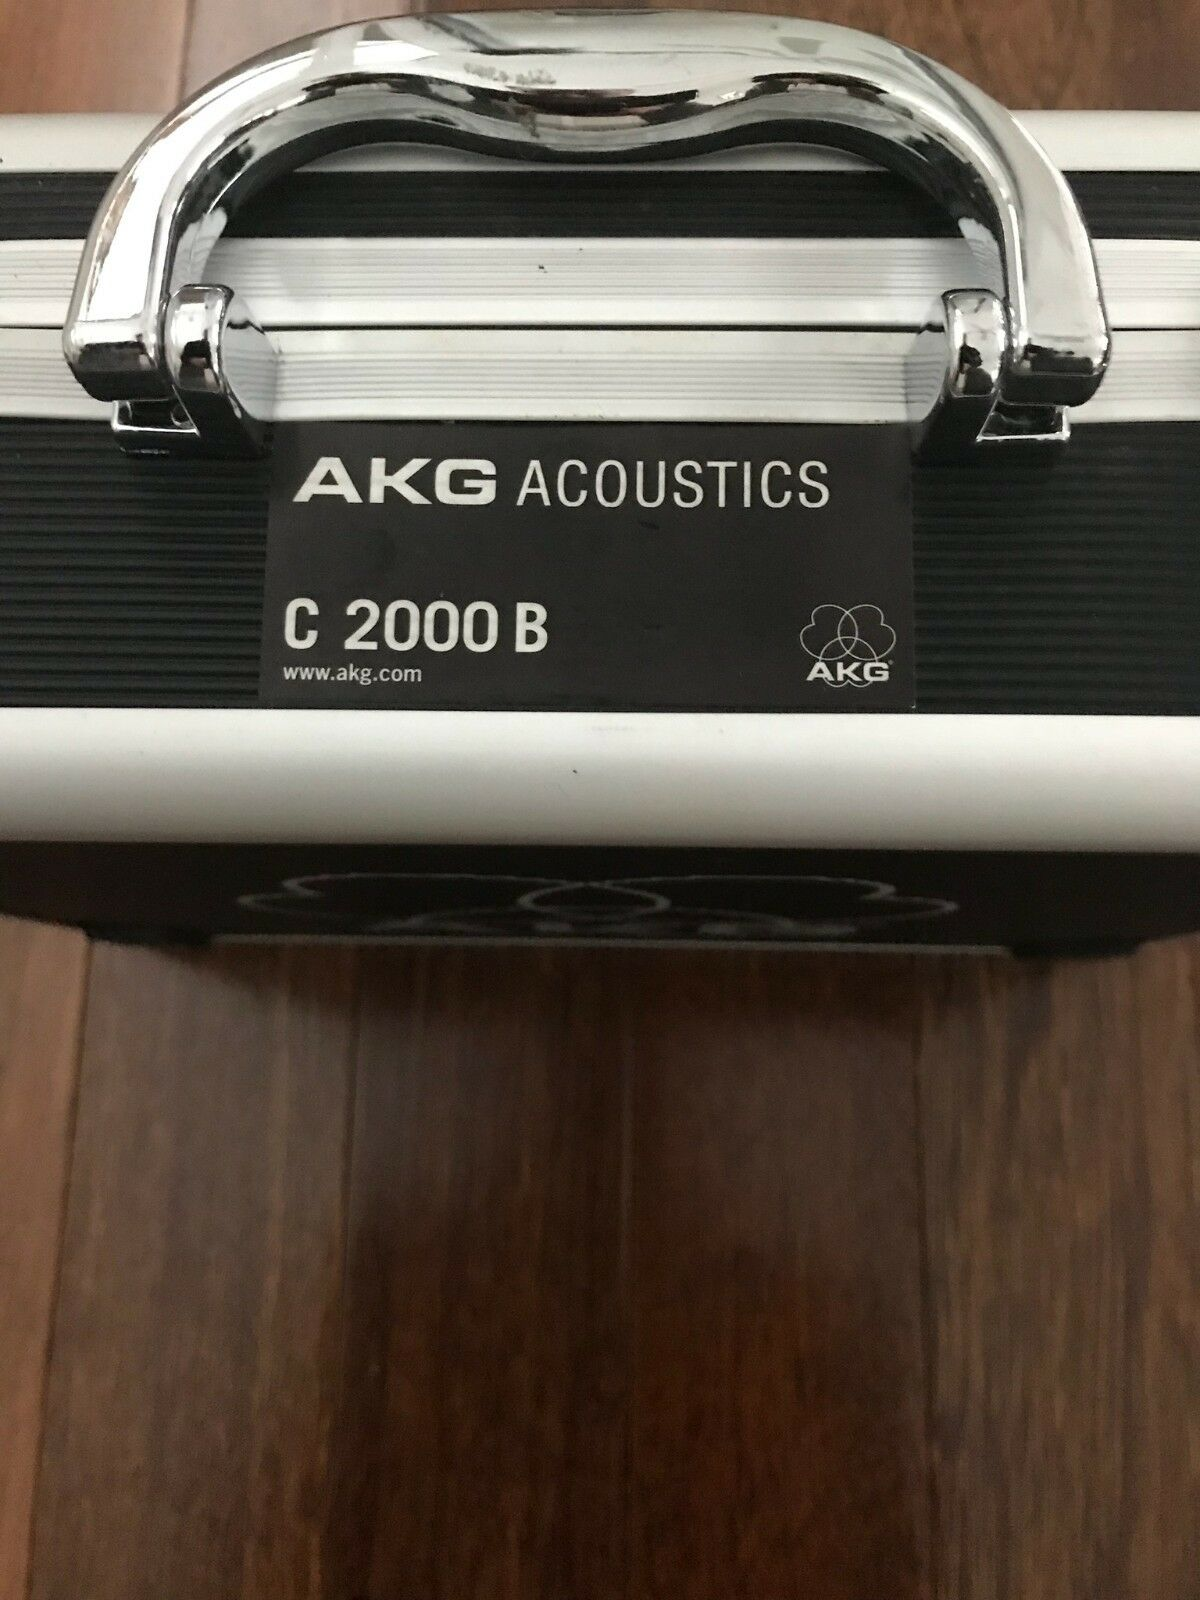 AKG C 2000 B Large Condenser Mikrofon - Neu